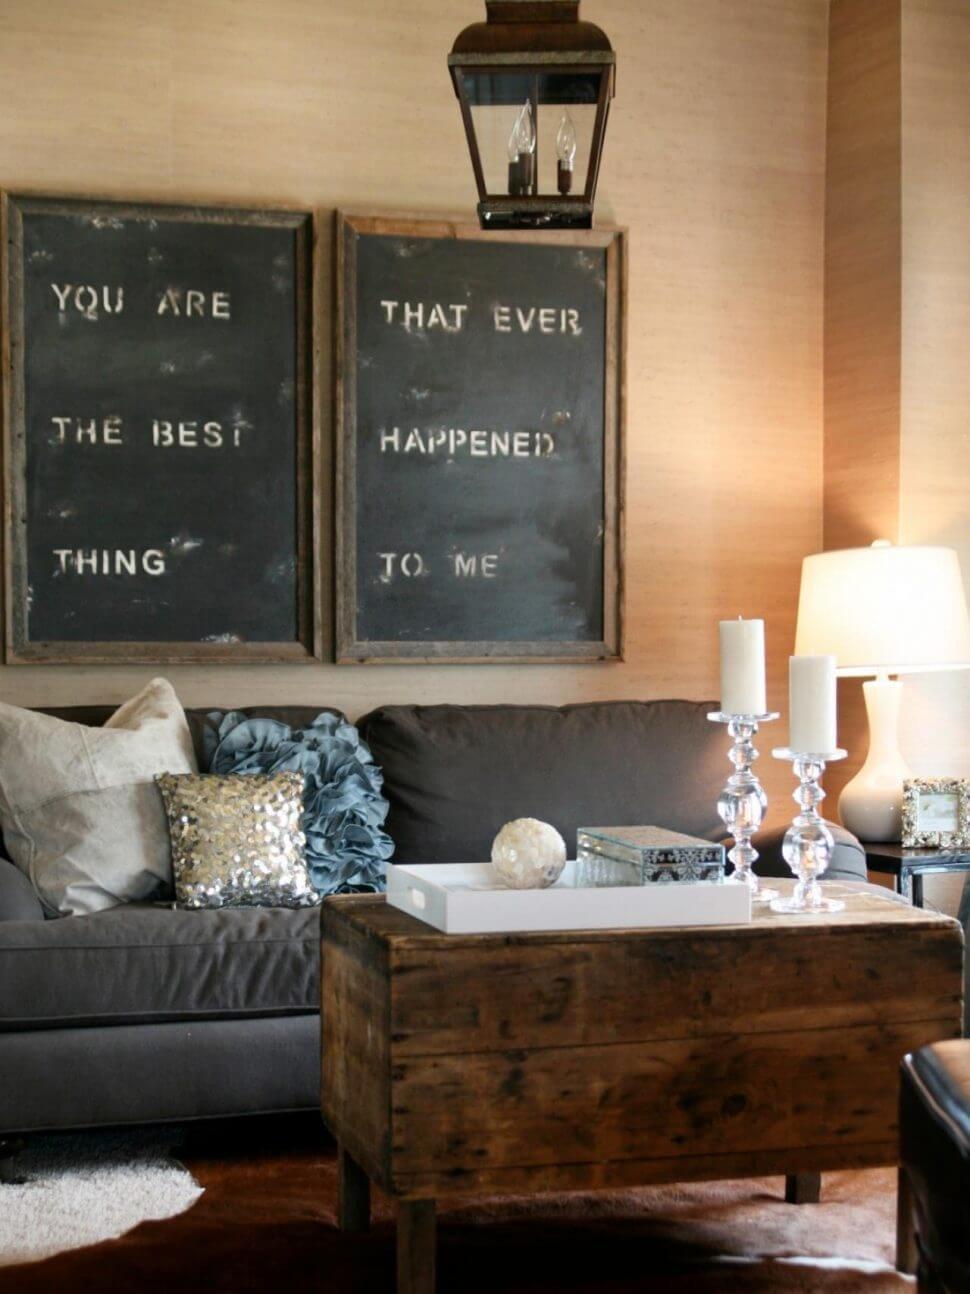 Family Room Wall Decor Ideas Lovely 33 Best Rustic Living Room Wall Decor Ideas and Designs for 2019